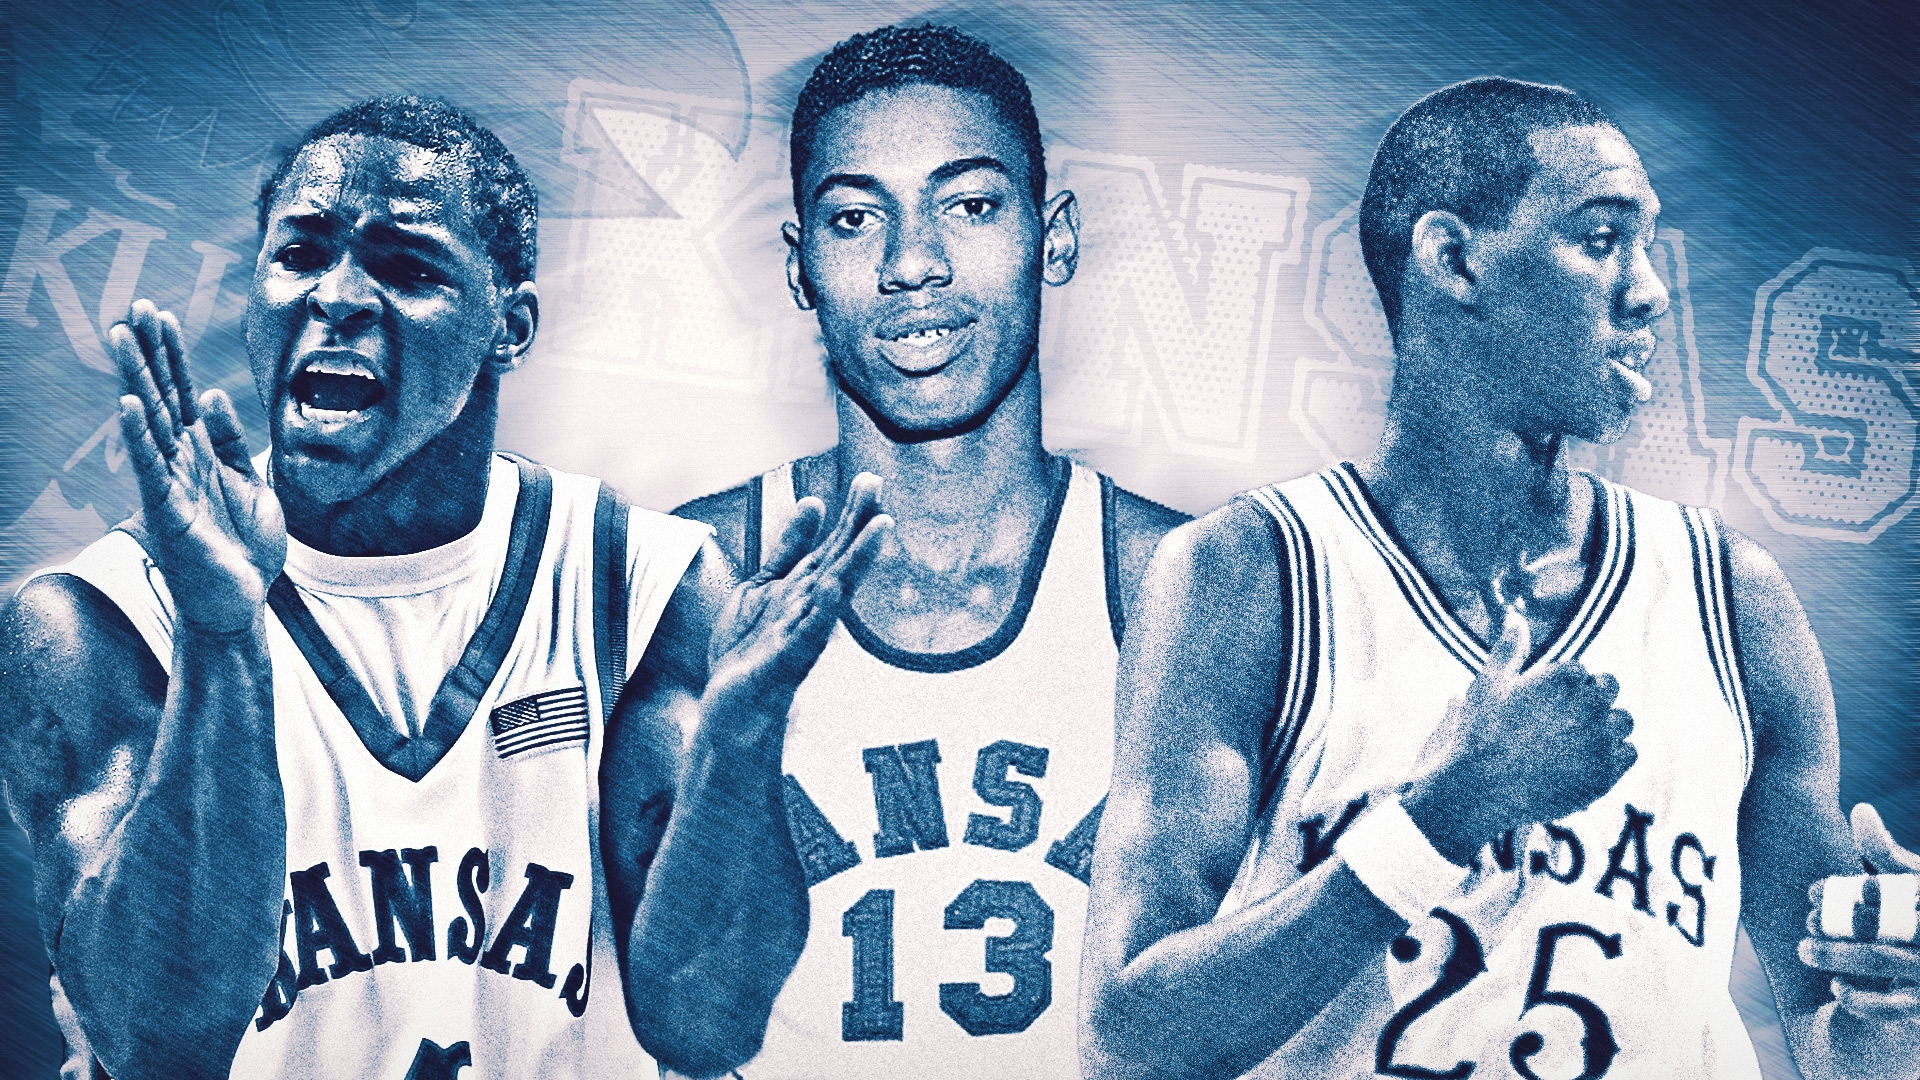 10 Greatest Kentucky Basketball Players Of All Time: 10 Greatest Kansas Basketball Players Of All Time